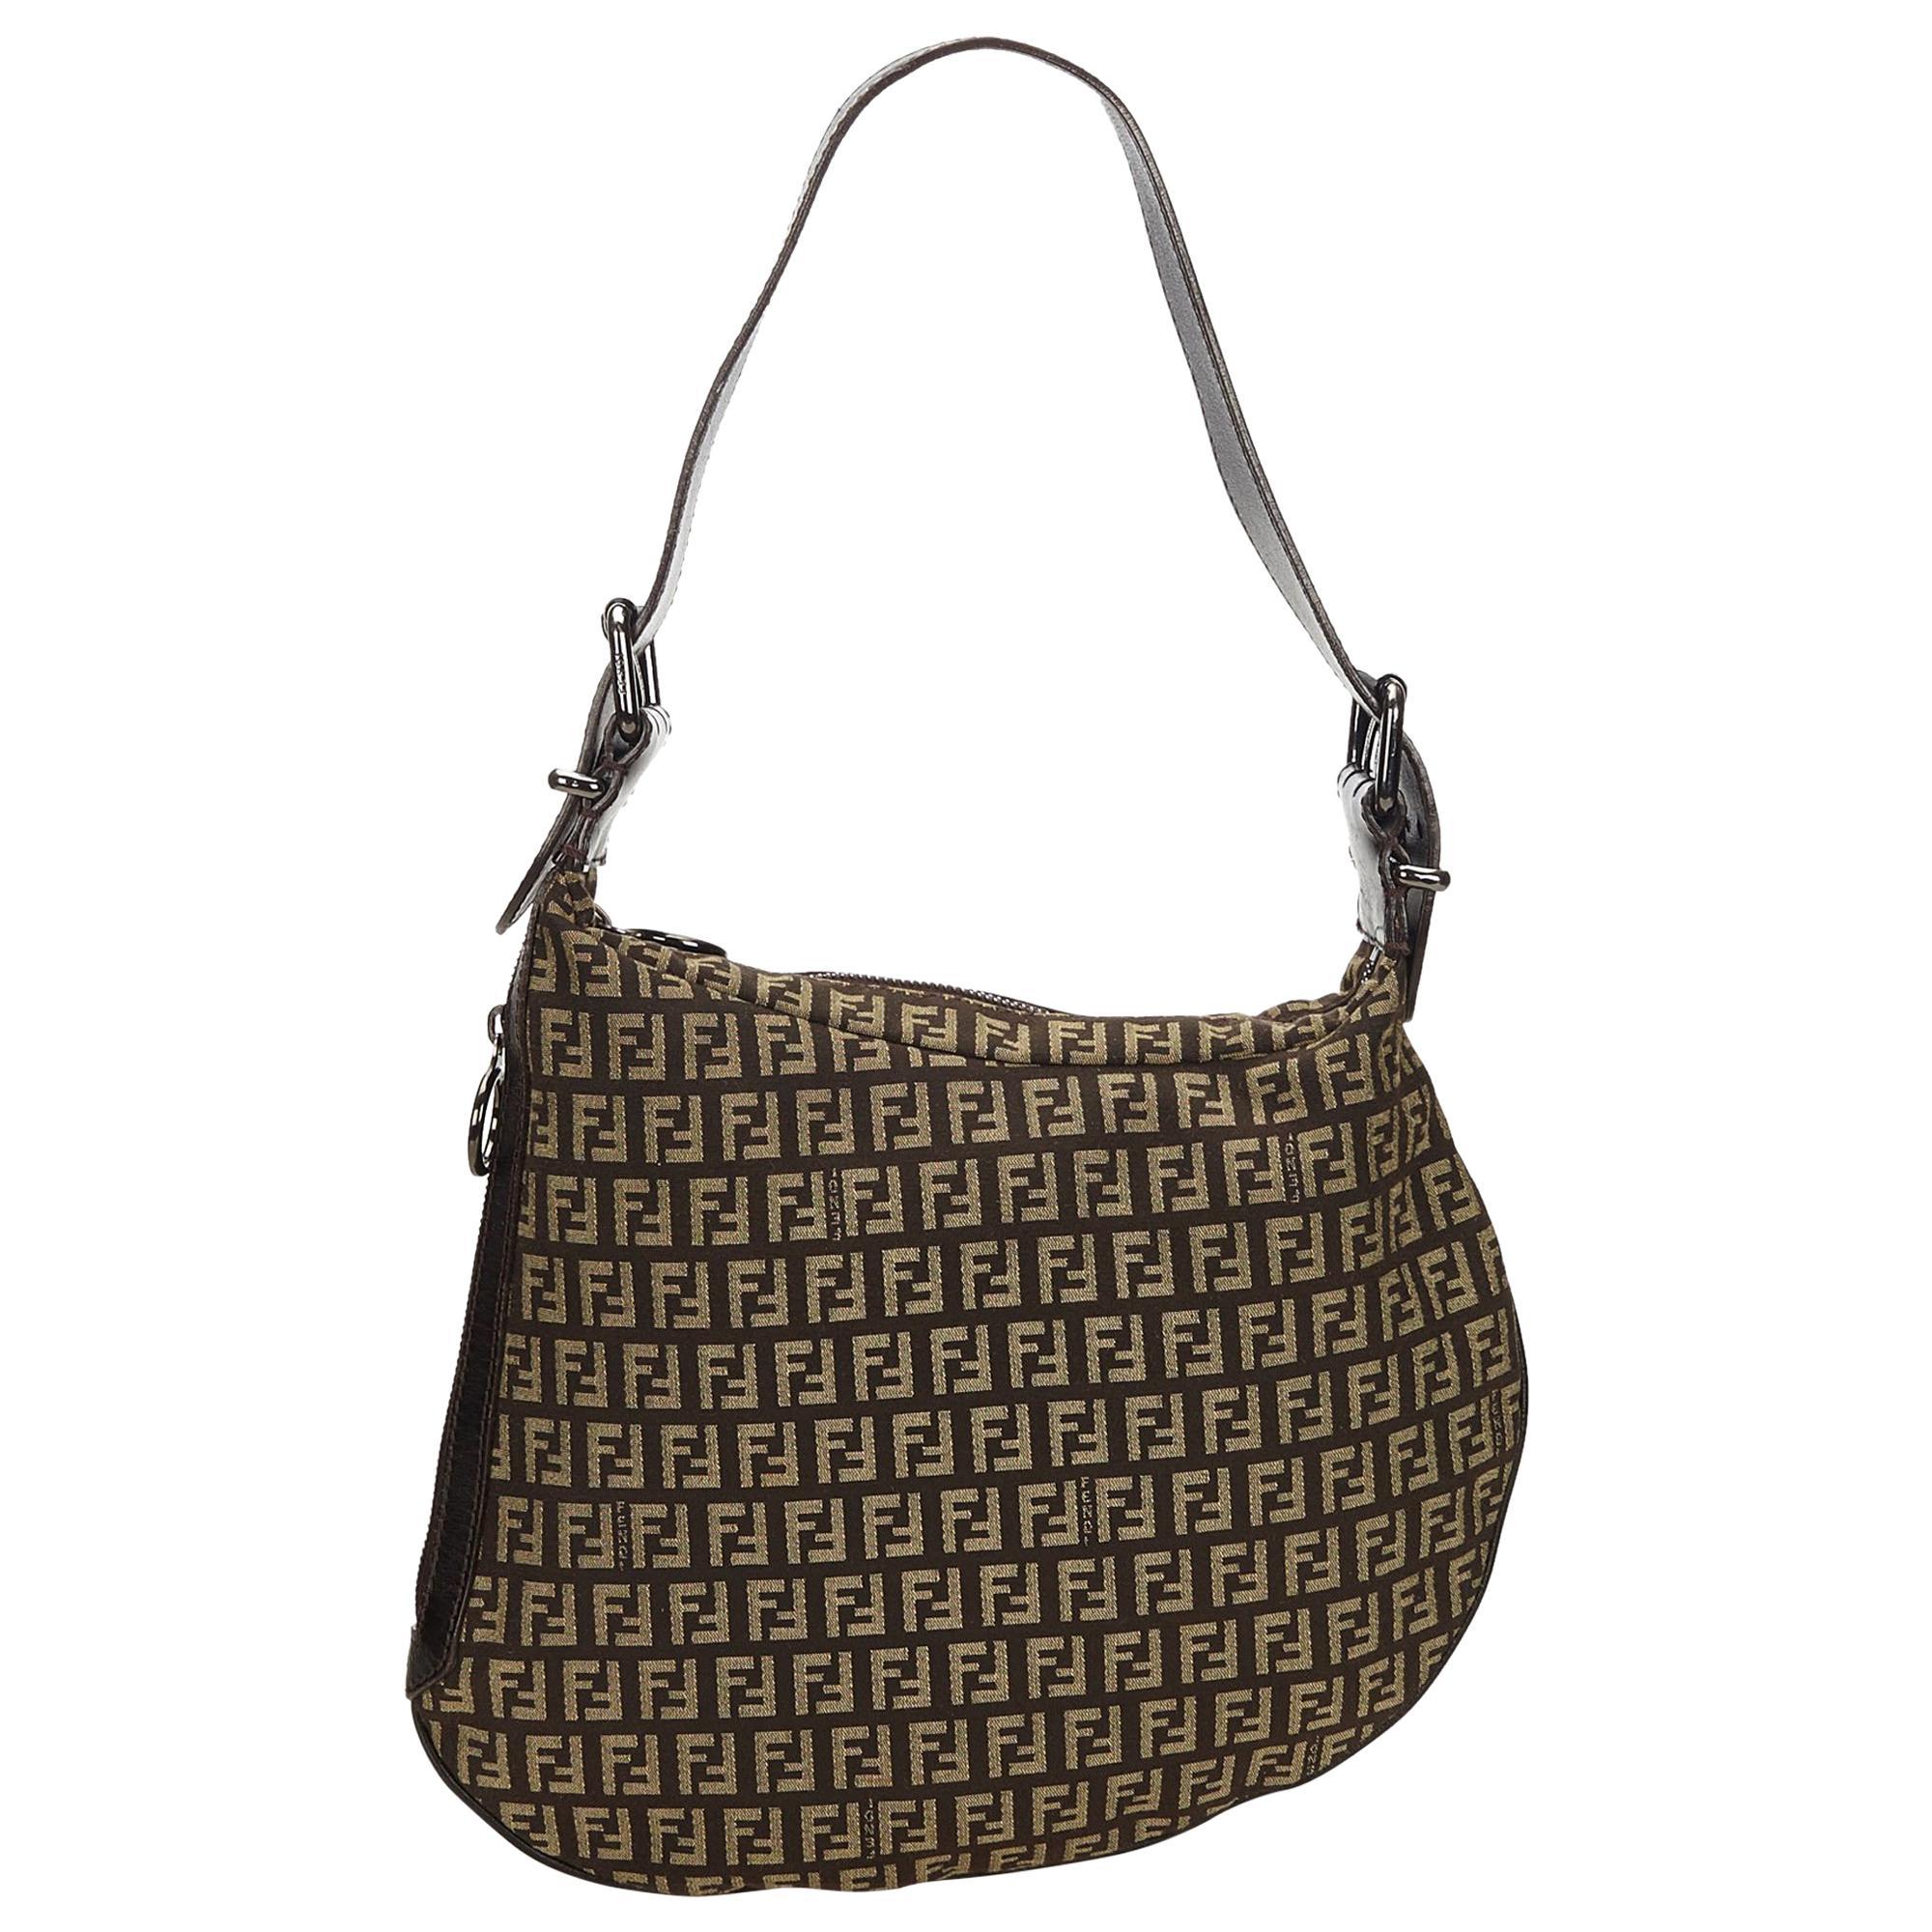 31e010d2b3c ... designer lambskin b1d0f 3675a coupon code for fendi brown zucchino  canvas shoulder bag 5790b a0366 ...